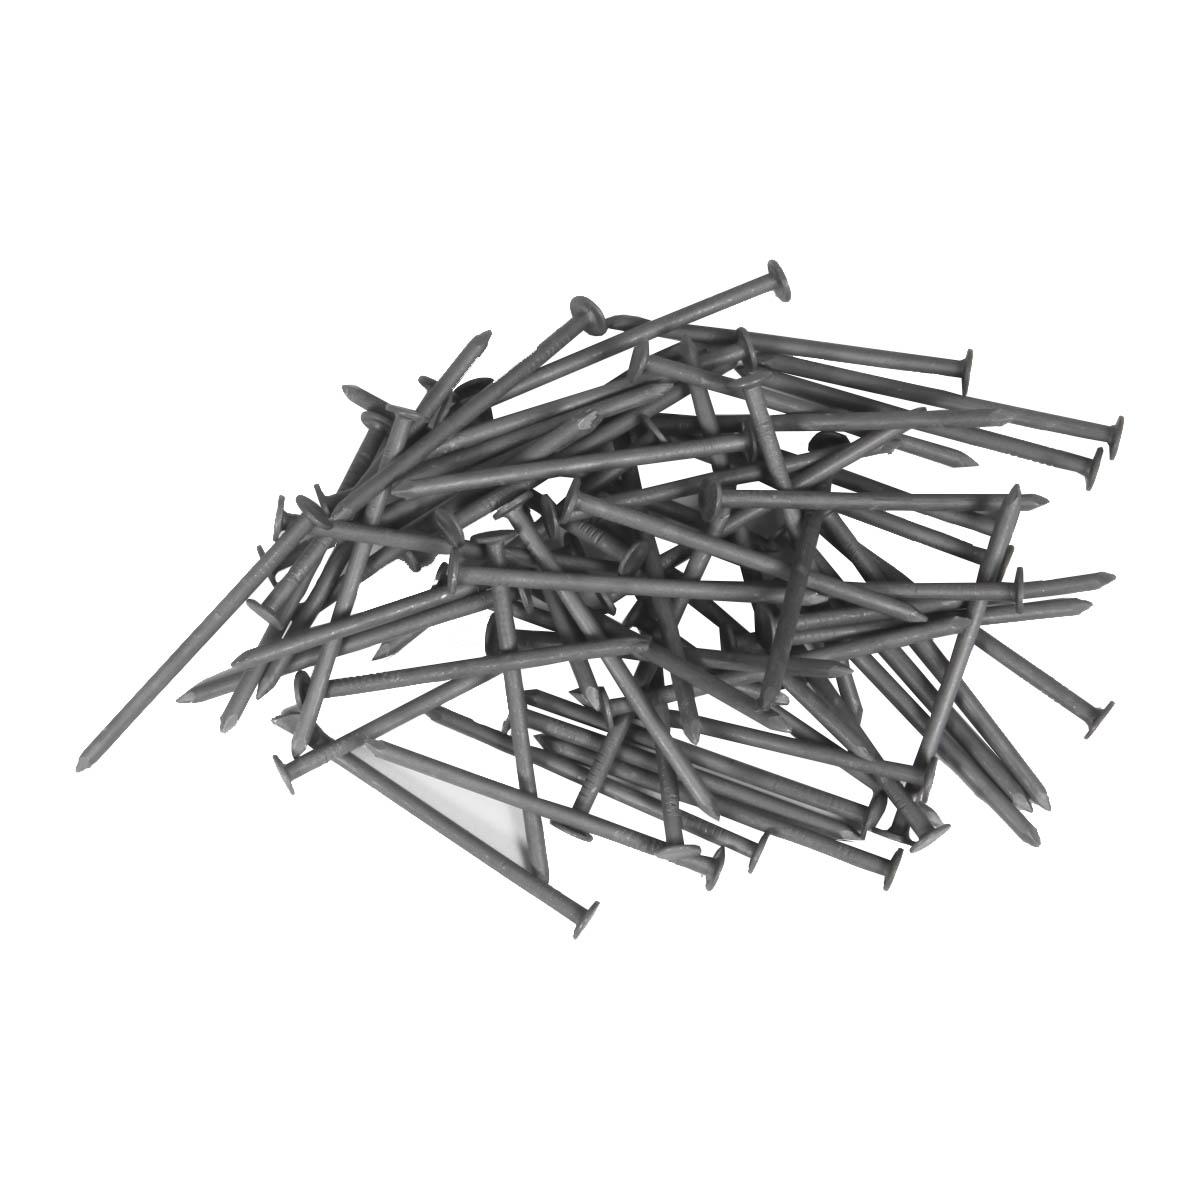 Phosphate Coated Nails - 2-1/2-in